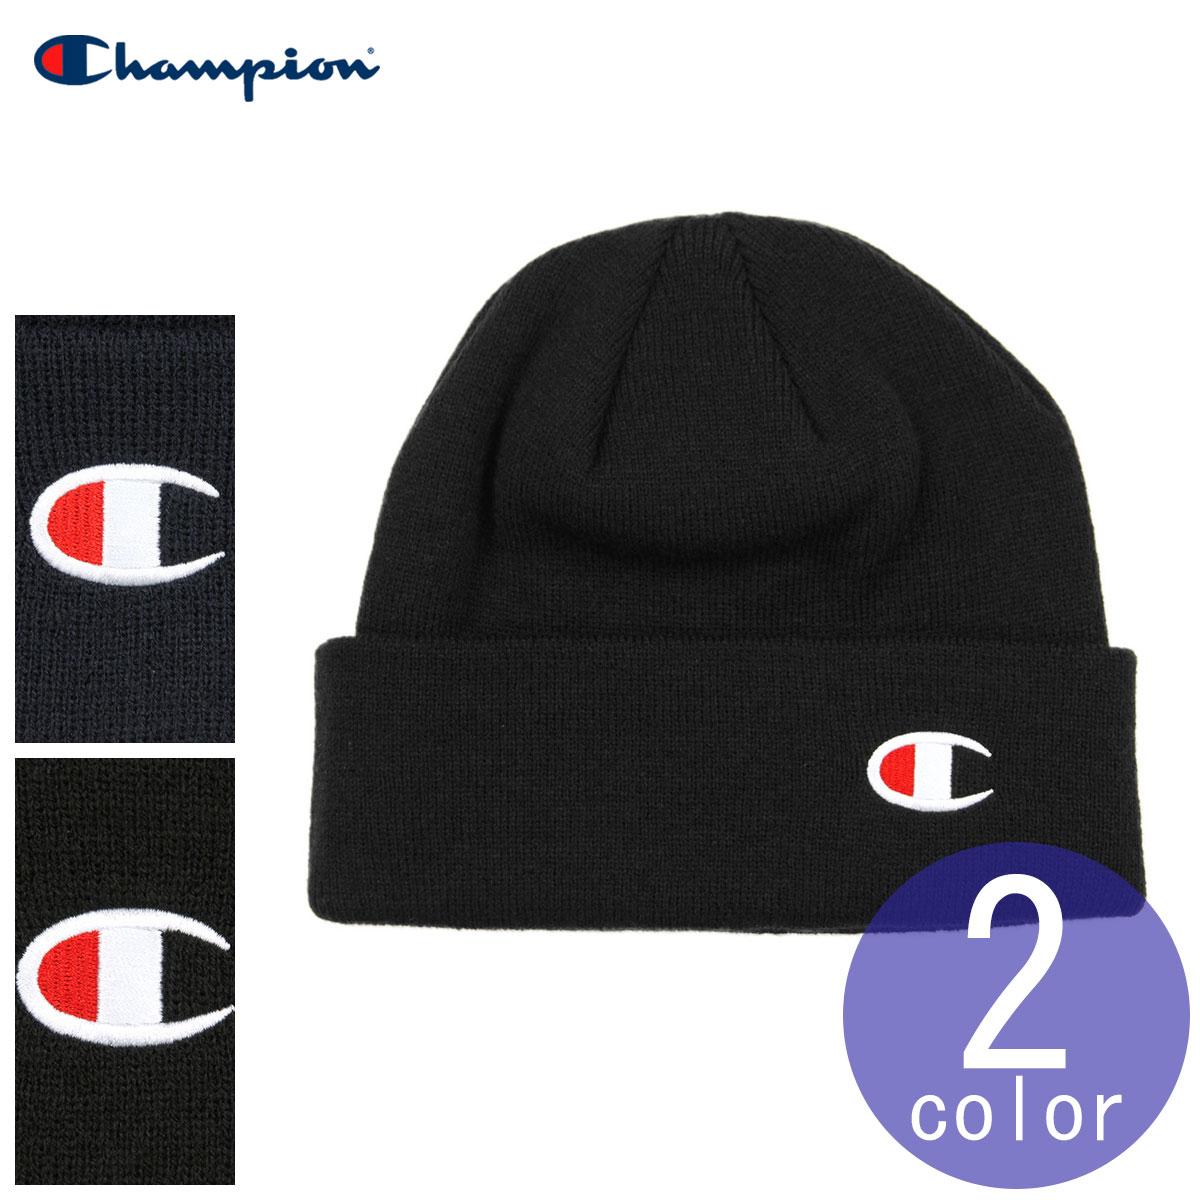 a282f167 Champion CHAMPION regular article knit cap beanie watch cap BEANIE CAP  H1062 ...